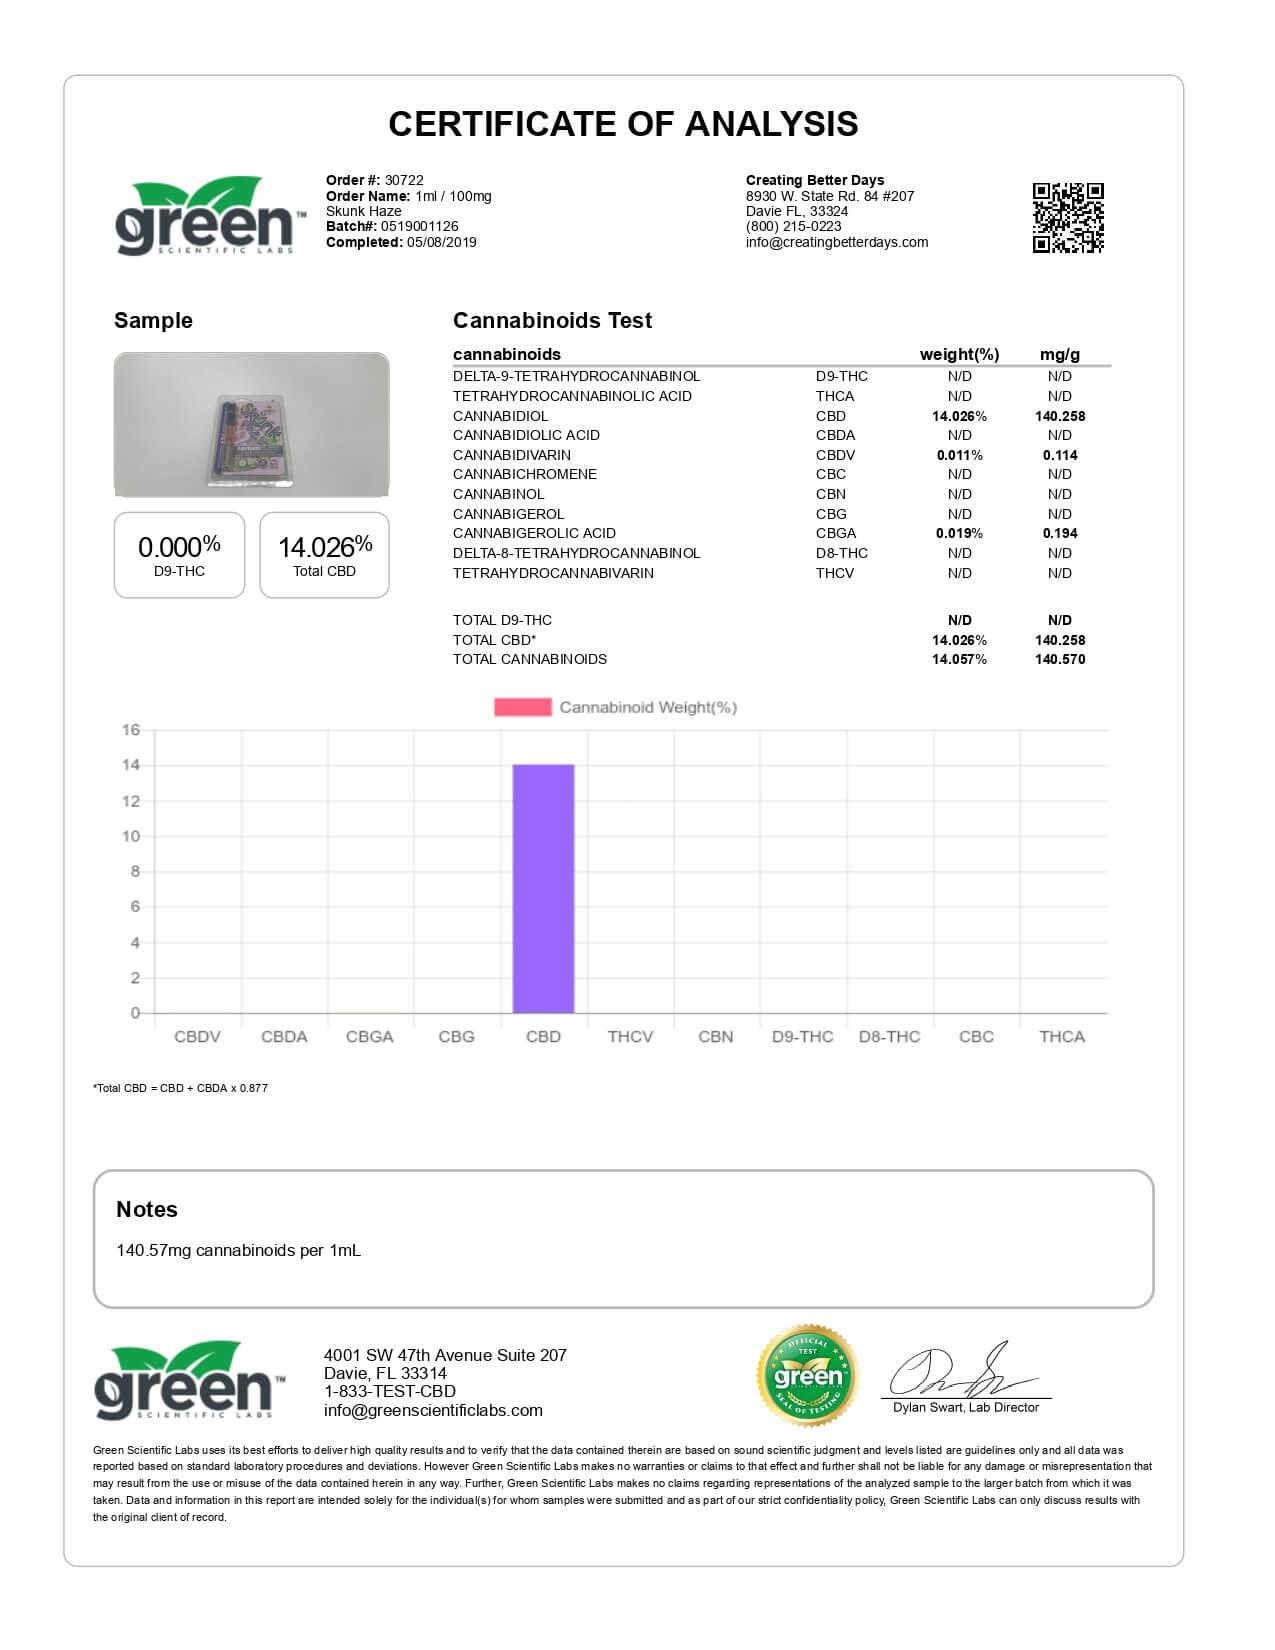 Creating Better Days CBD Cartridge Skunk Haze 100mg Lab Report